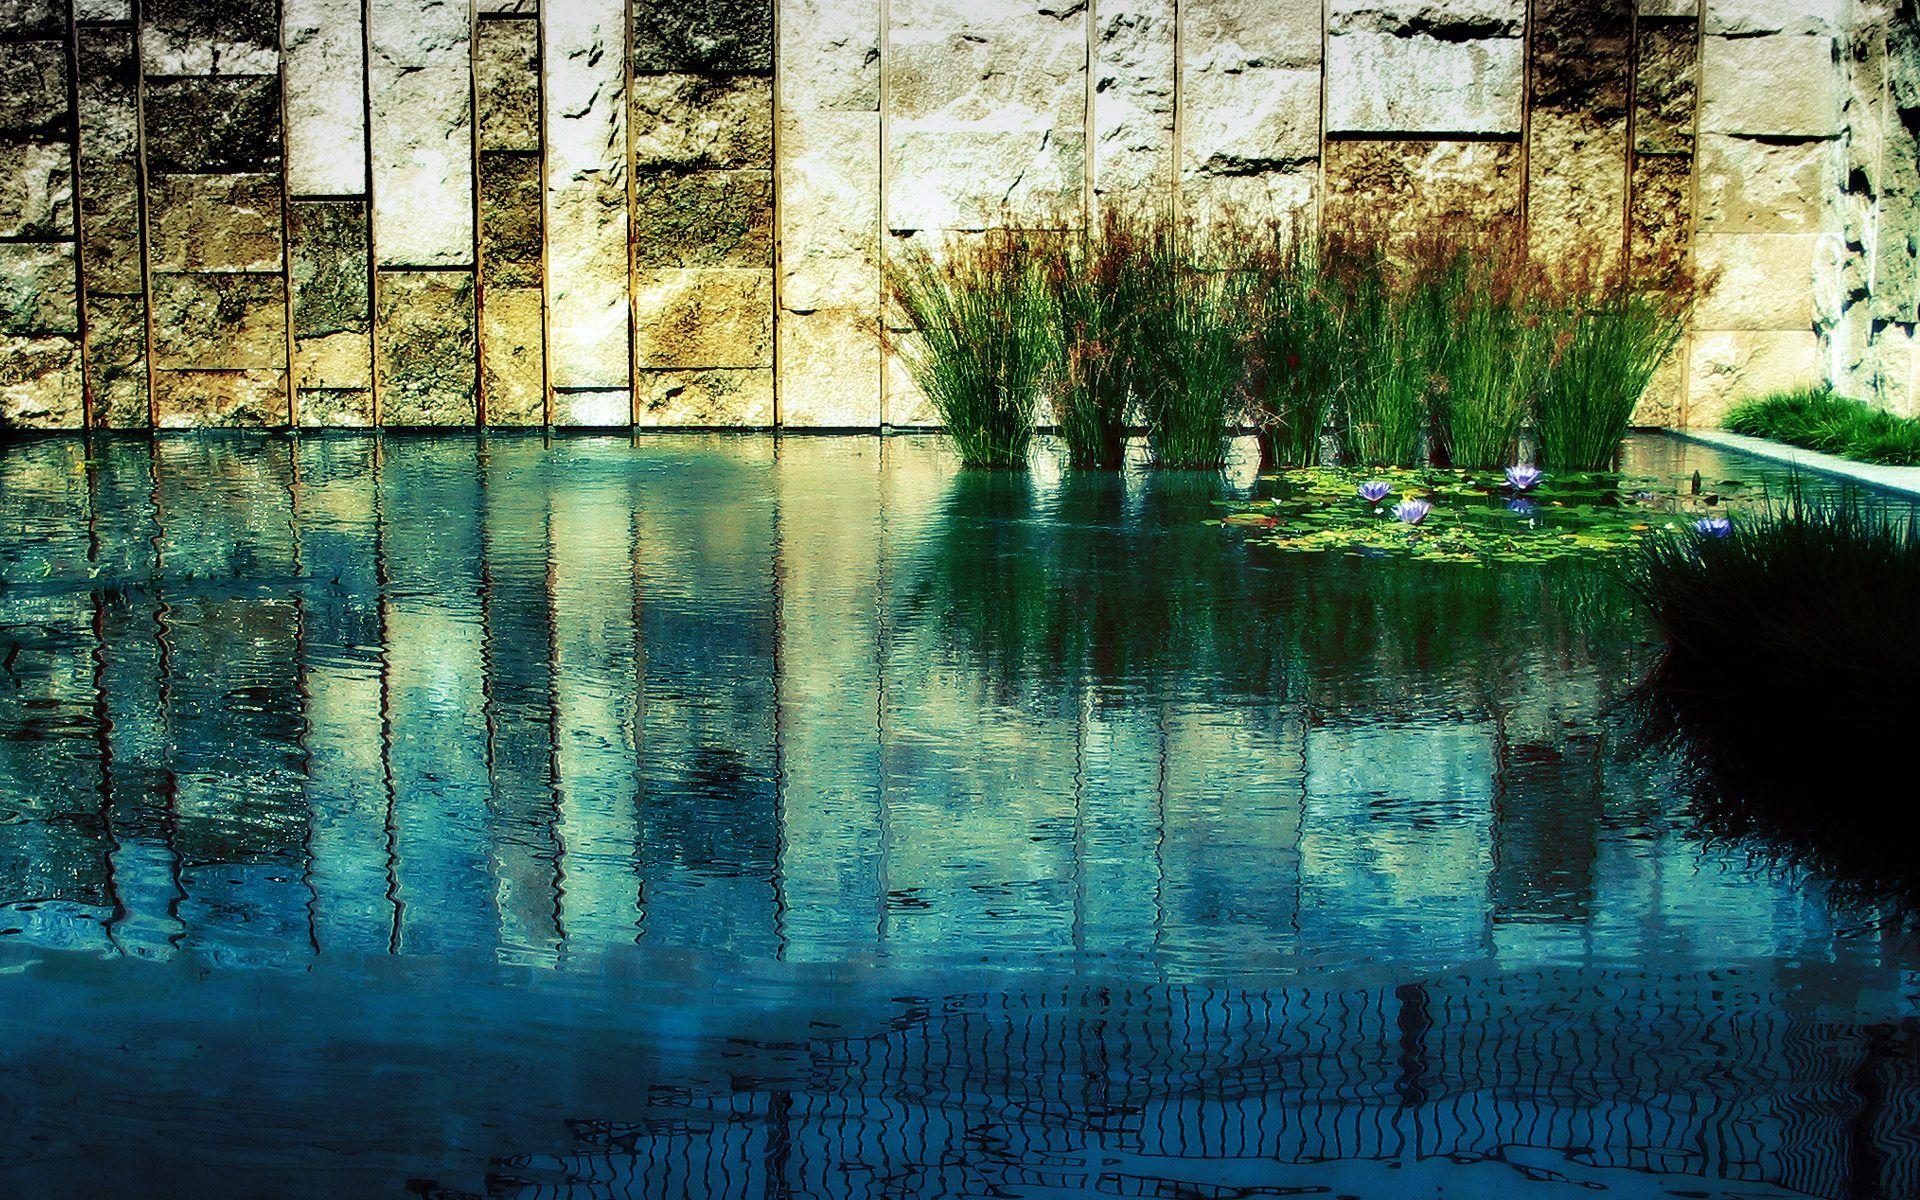 Season Zen Hd Live Wallpaper - Getty Villa , HD Wallpaper & Backgrounds